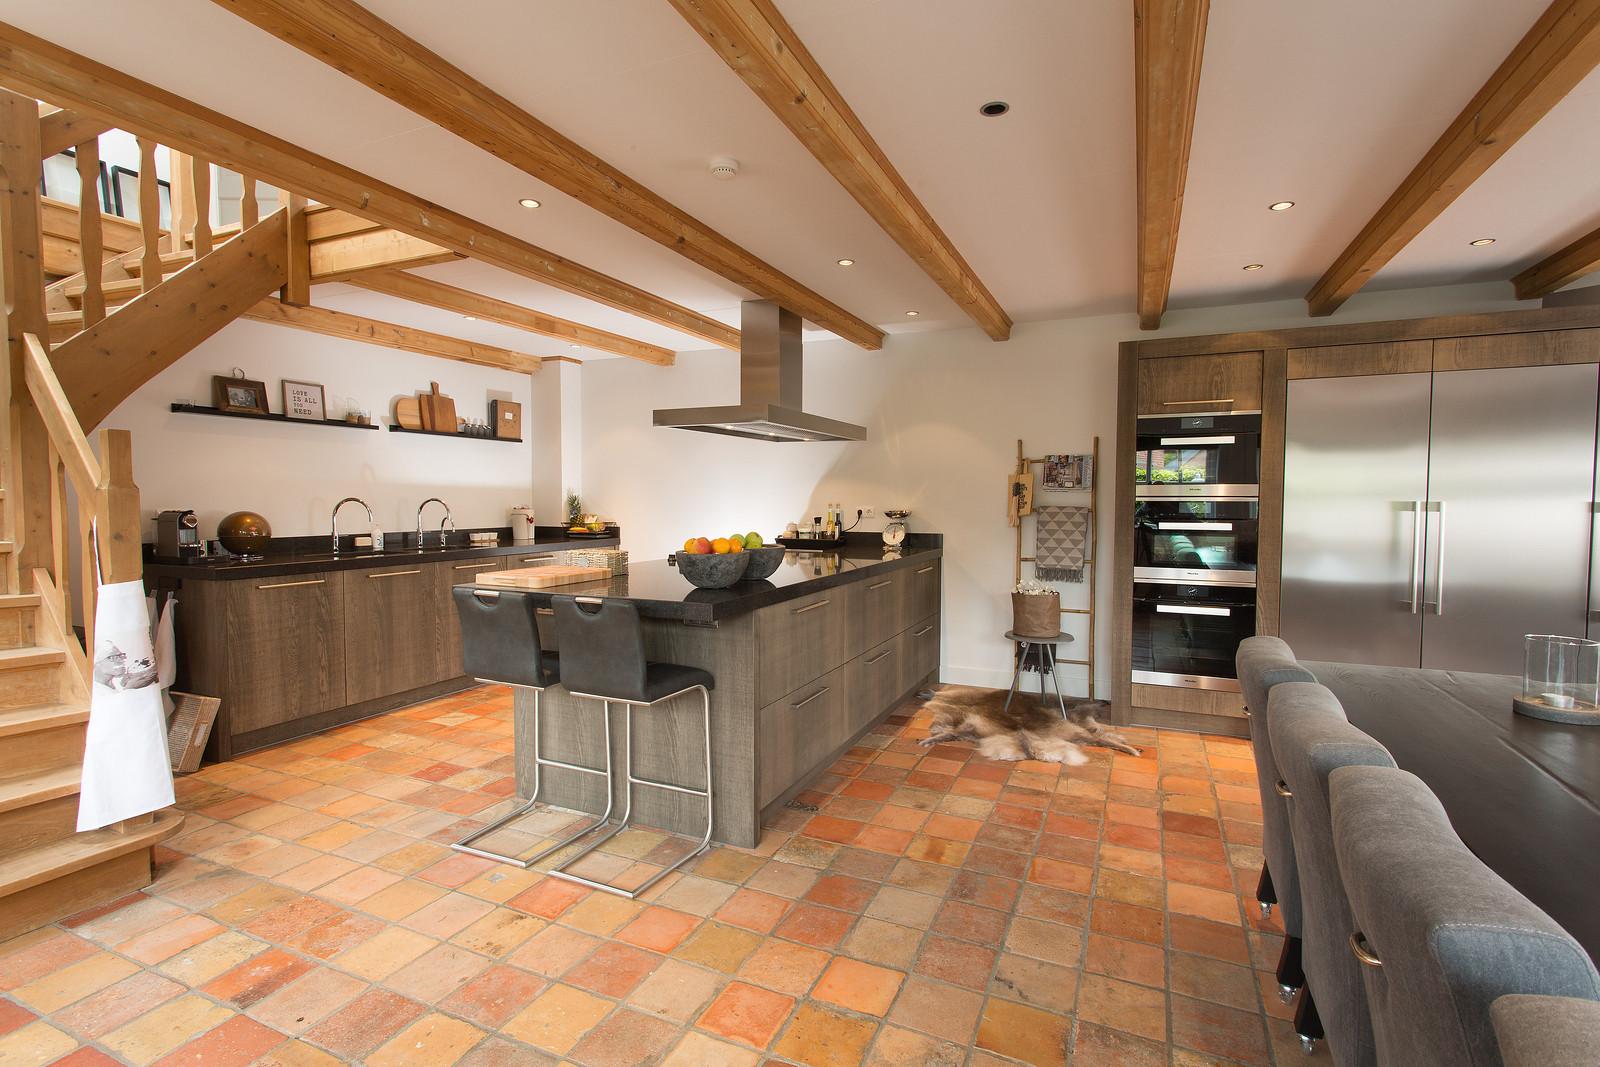 Tieleman keukens in middelharnis startpagina voor keuken ideeën ...